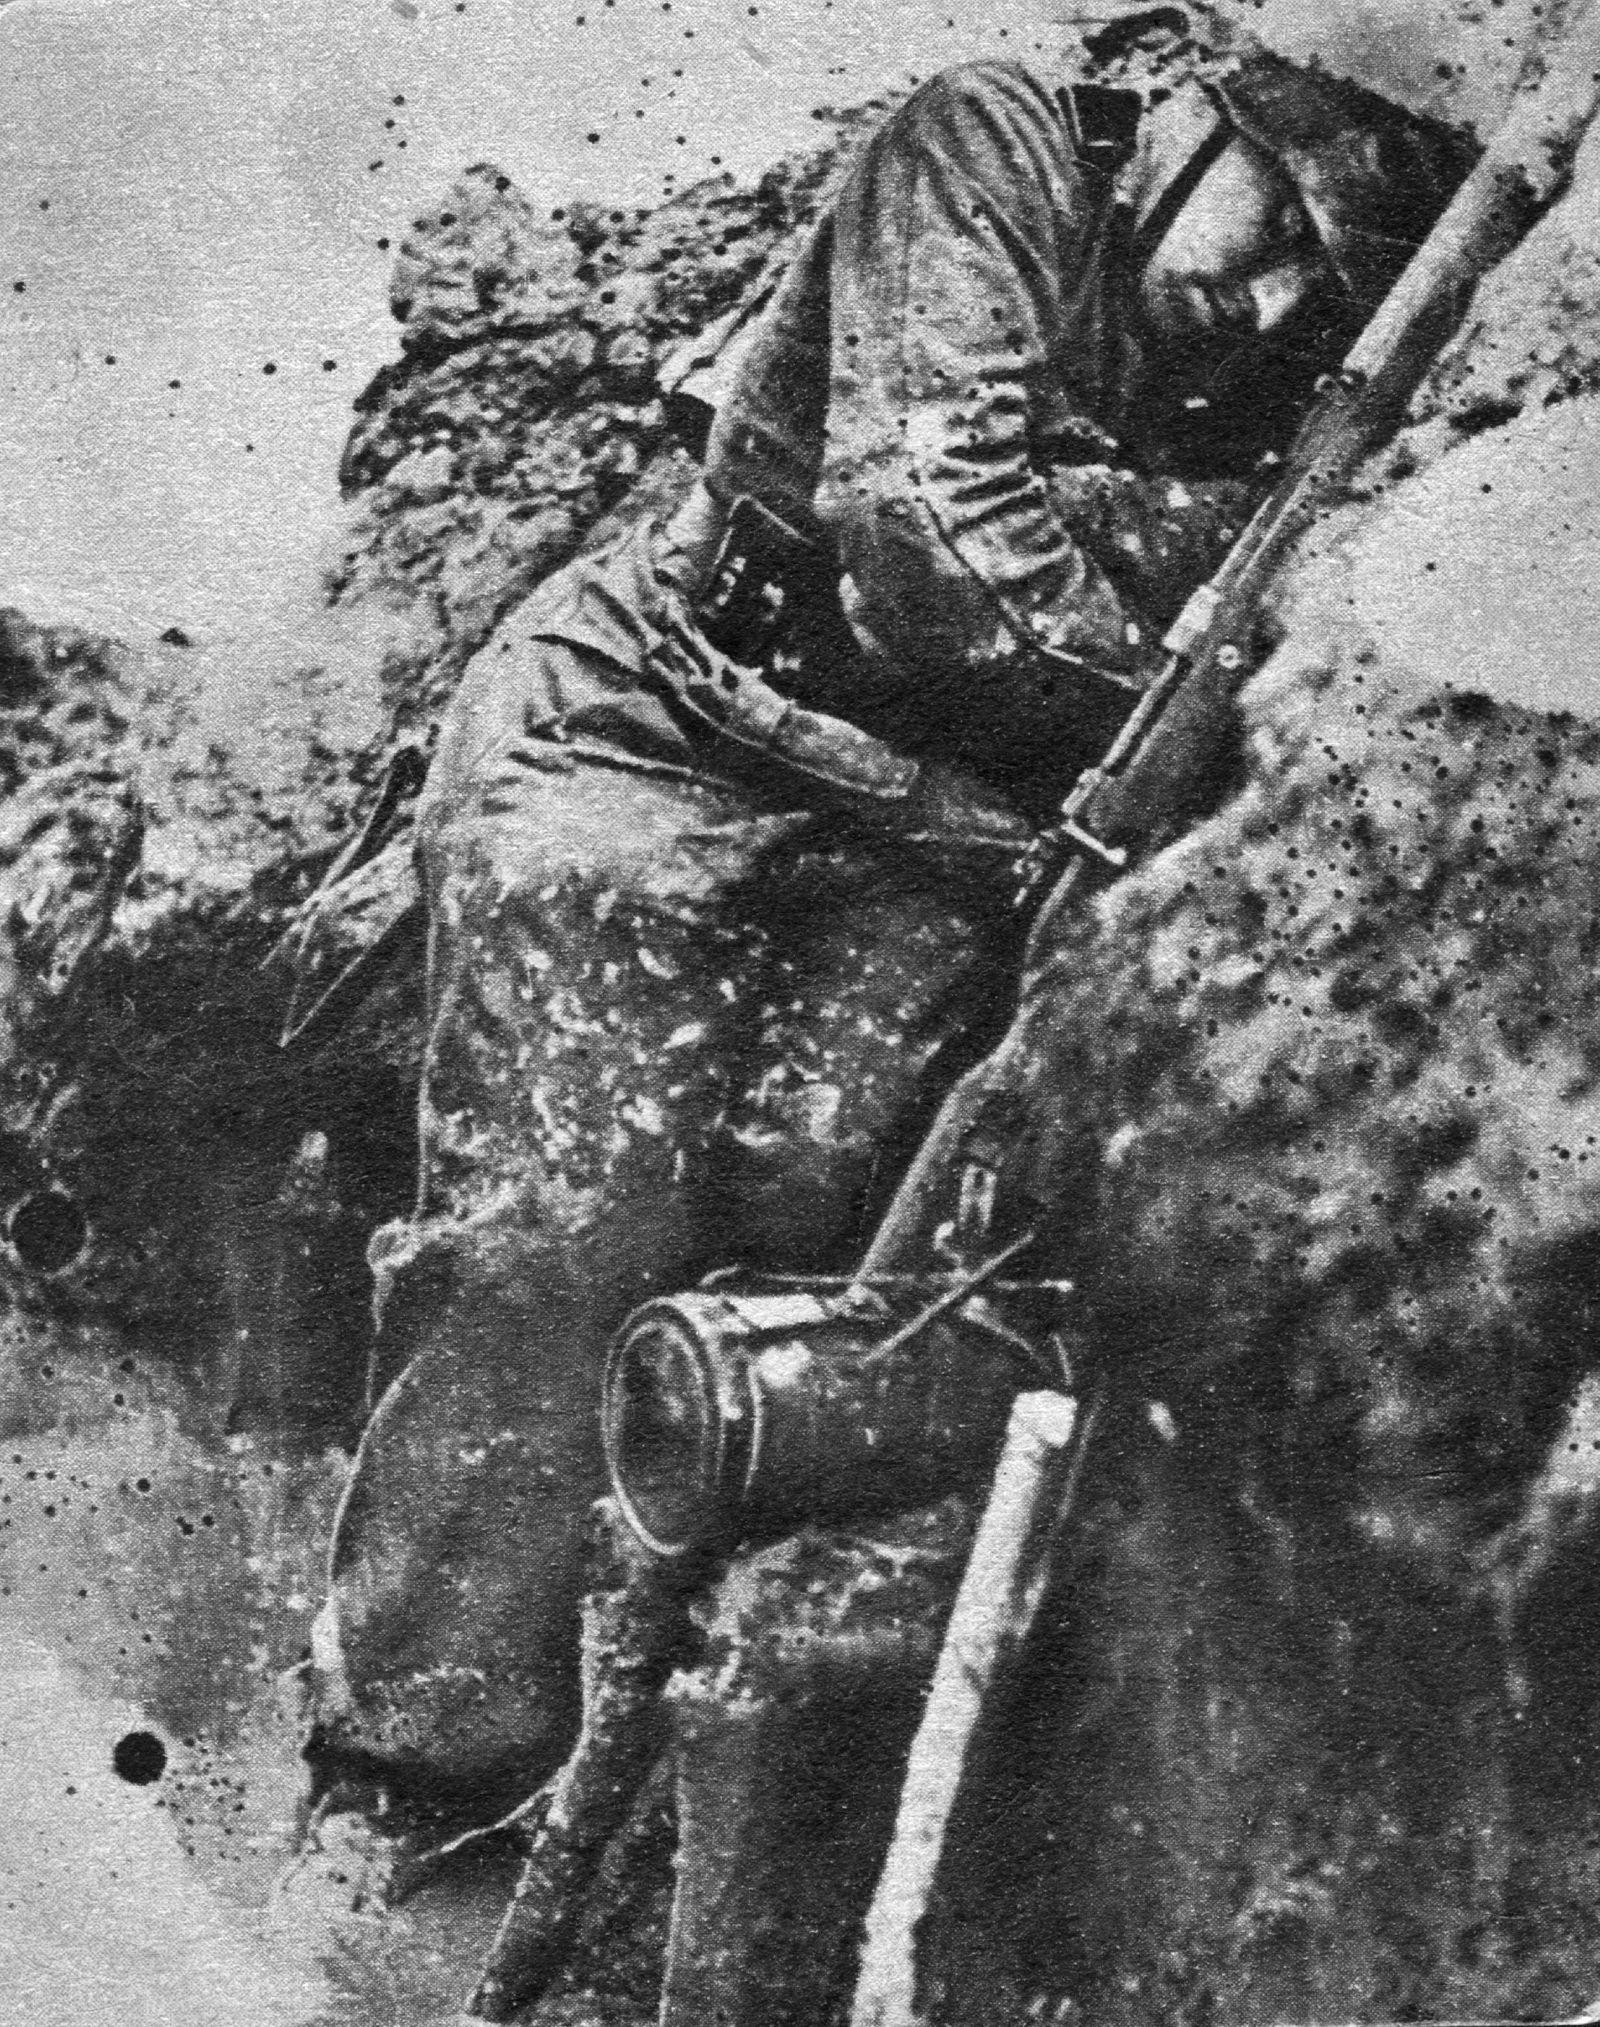 Kriegszitterer - Exhausted